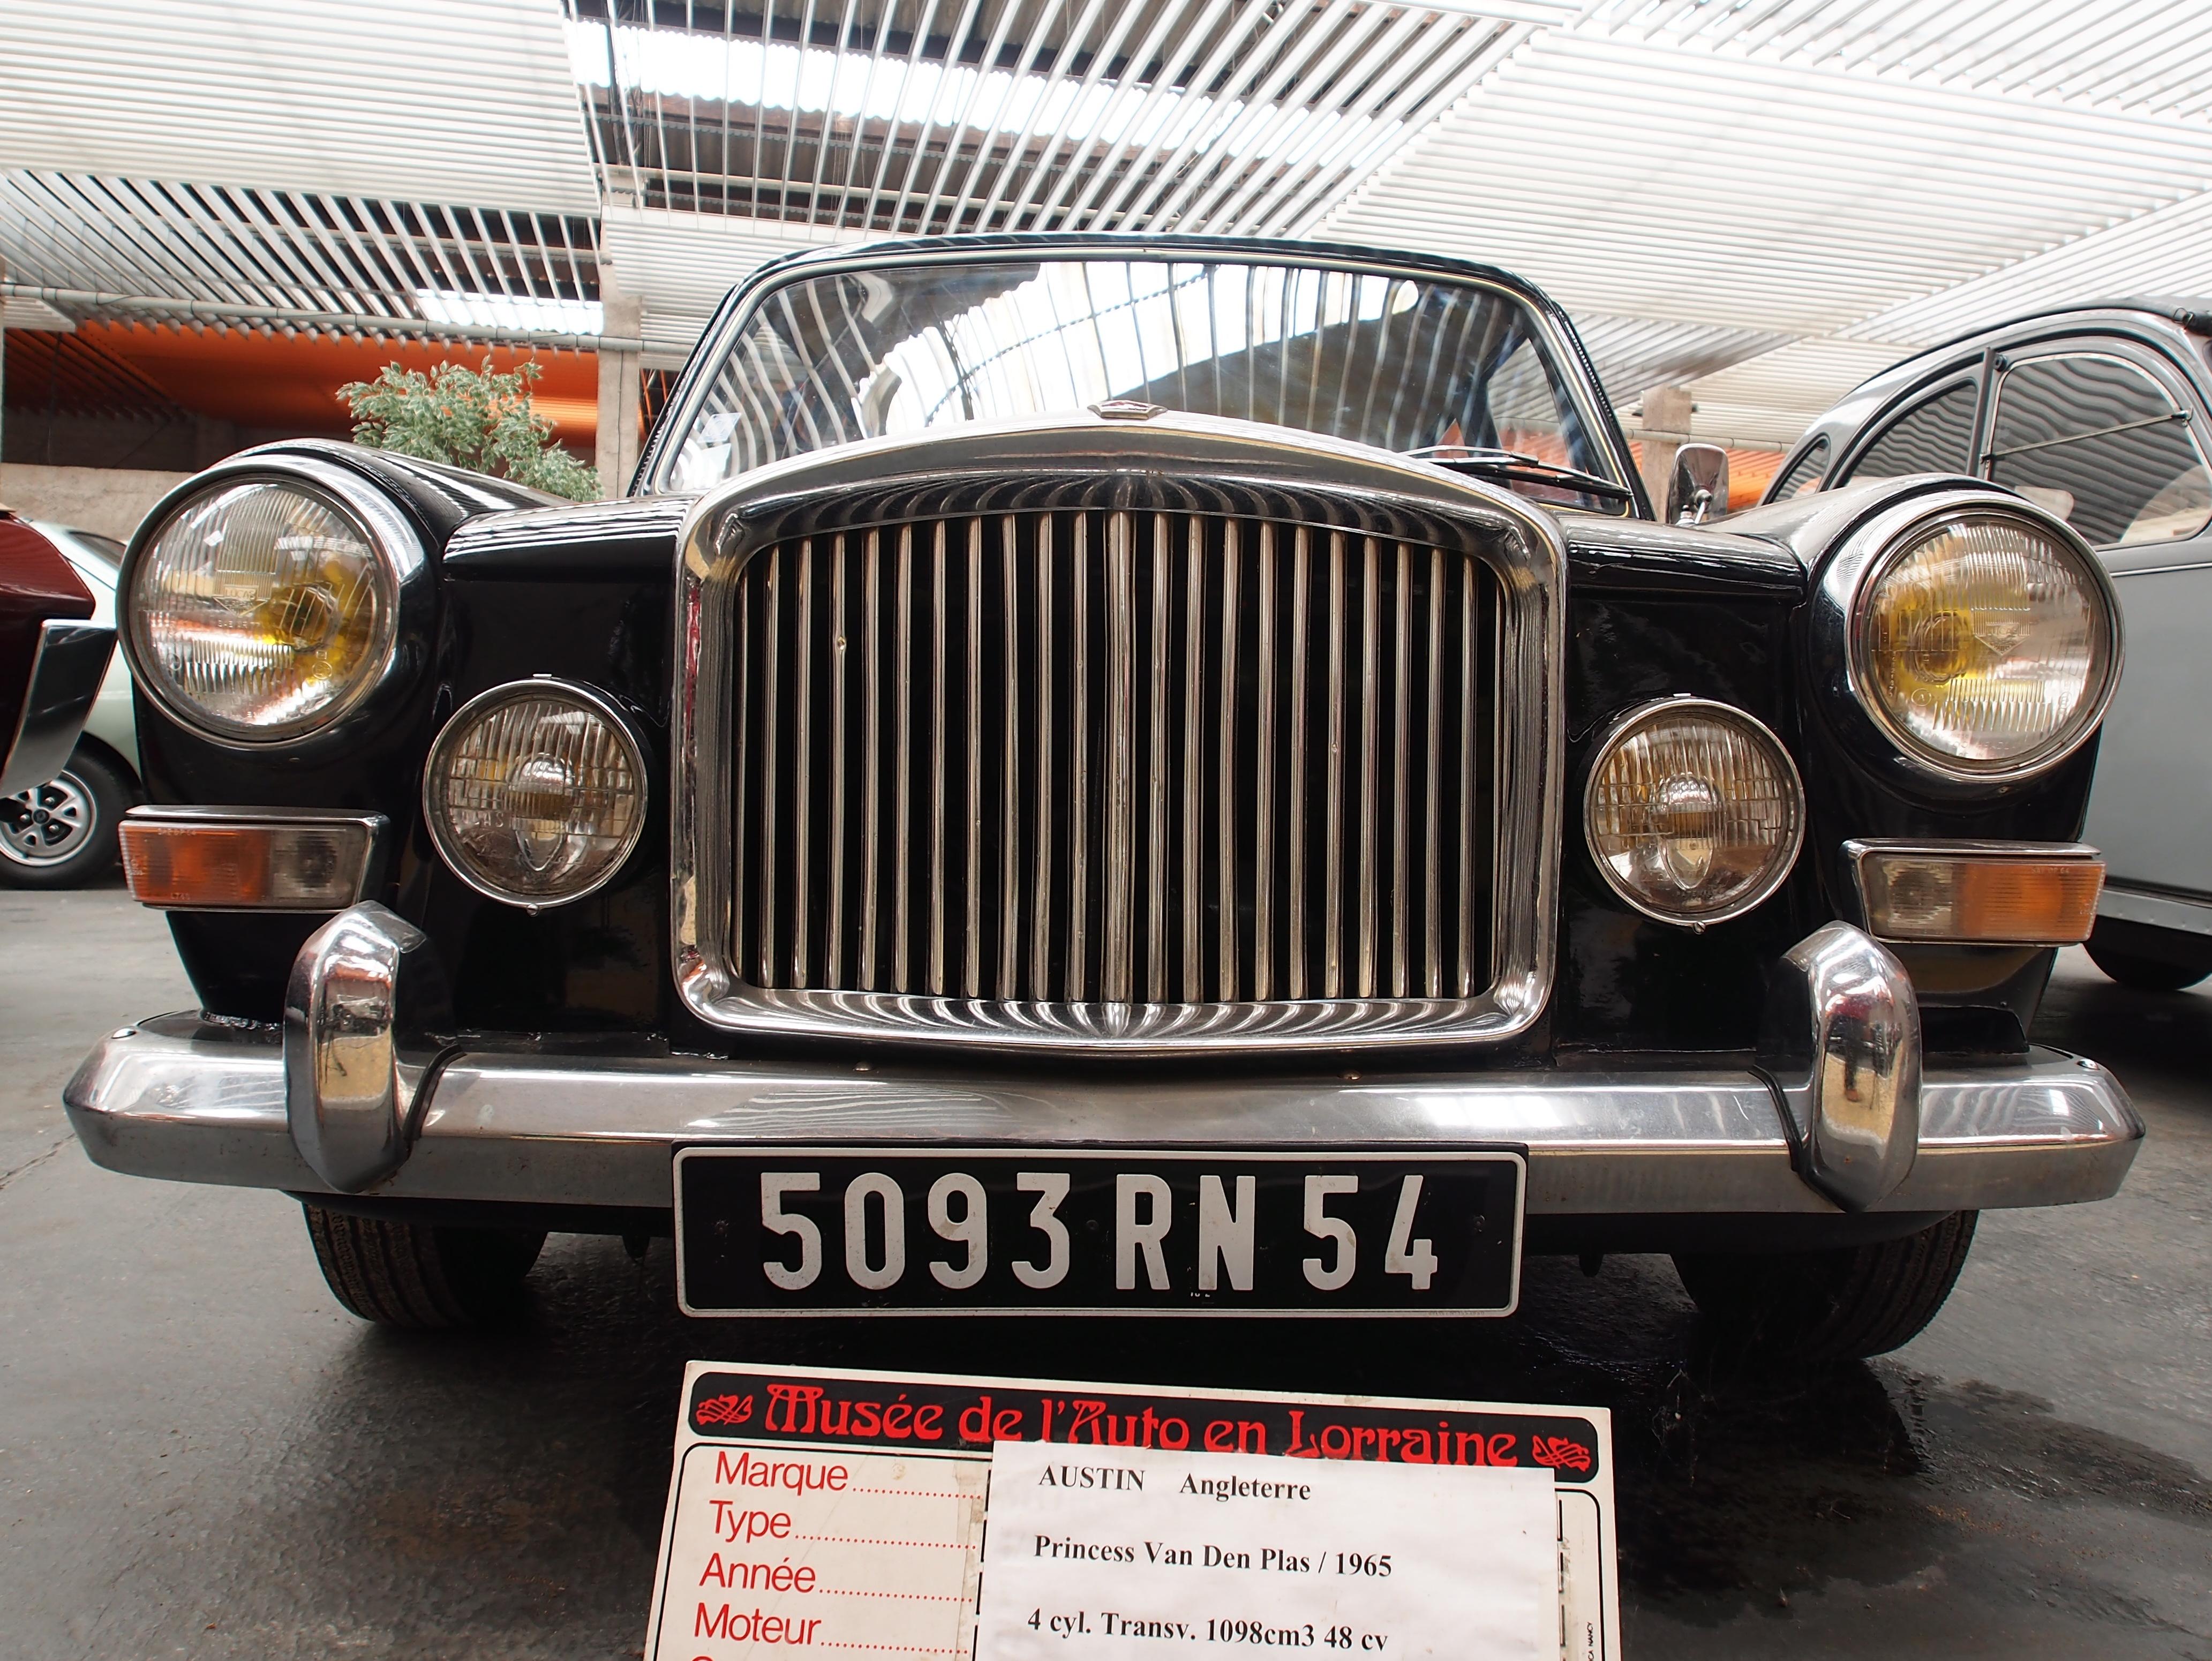 file 1965 austin angleterre  princess van den plas  4 cylinders  1098 cm3  48 cv  pic3 jpg